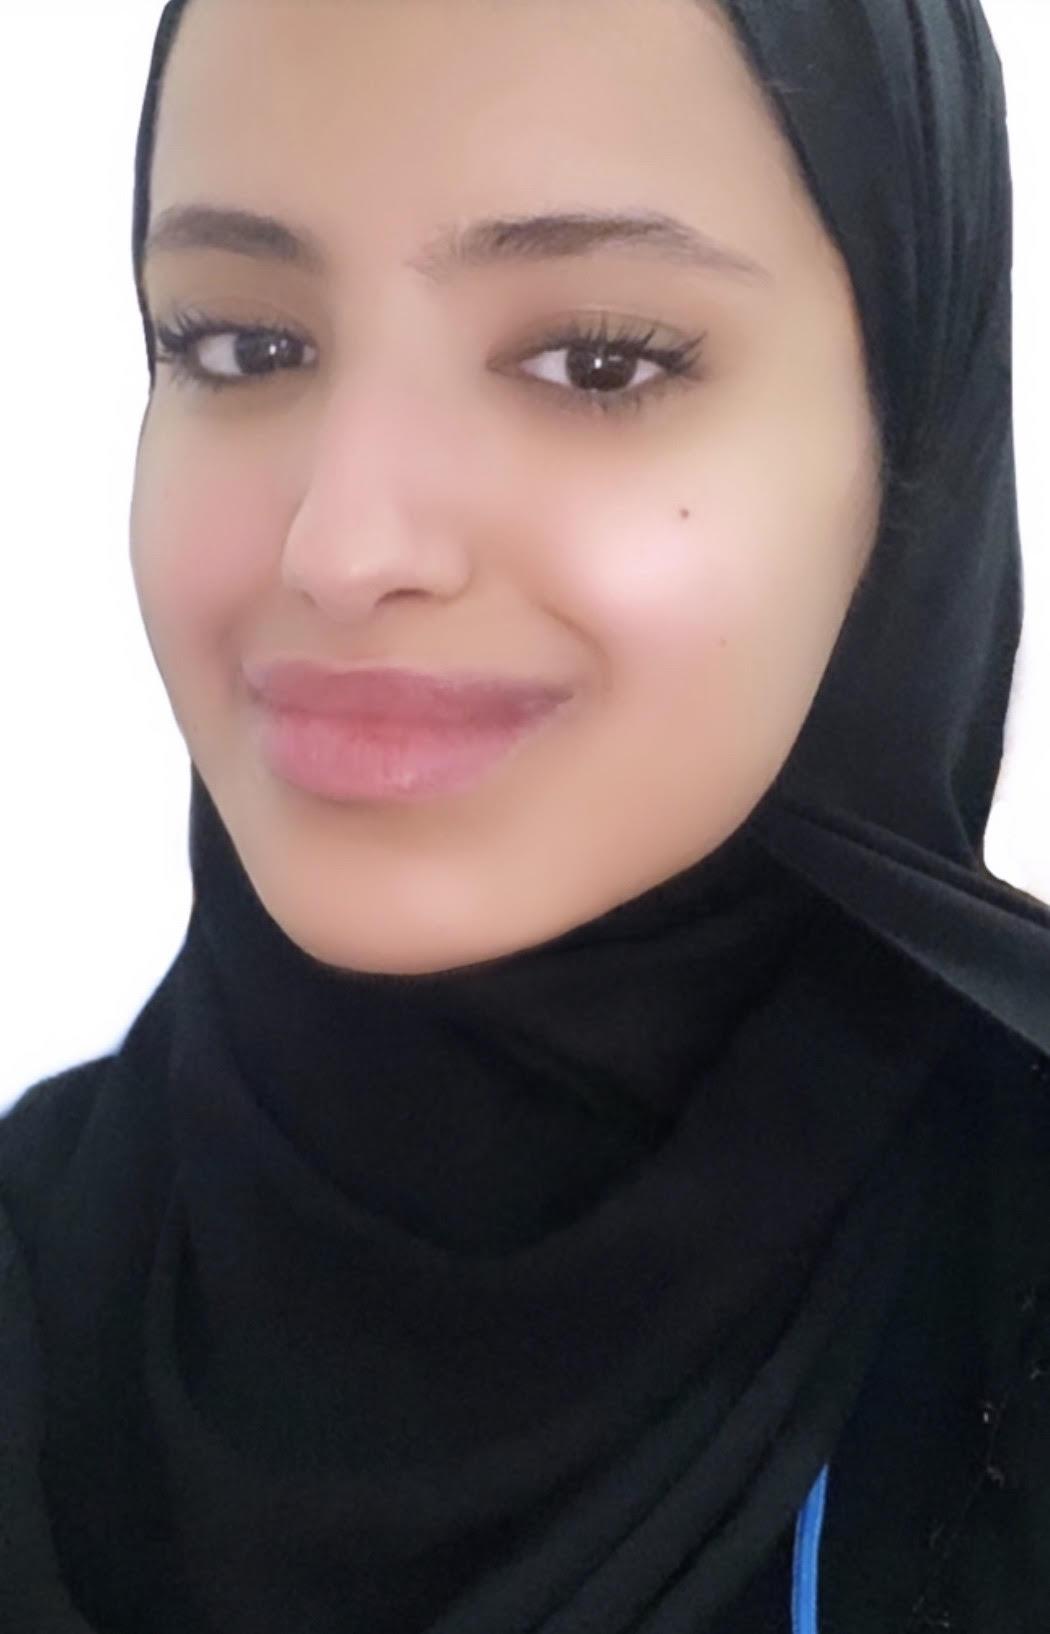 Sumayya Mohammed Muqbel Salem